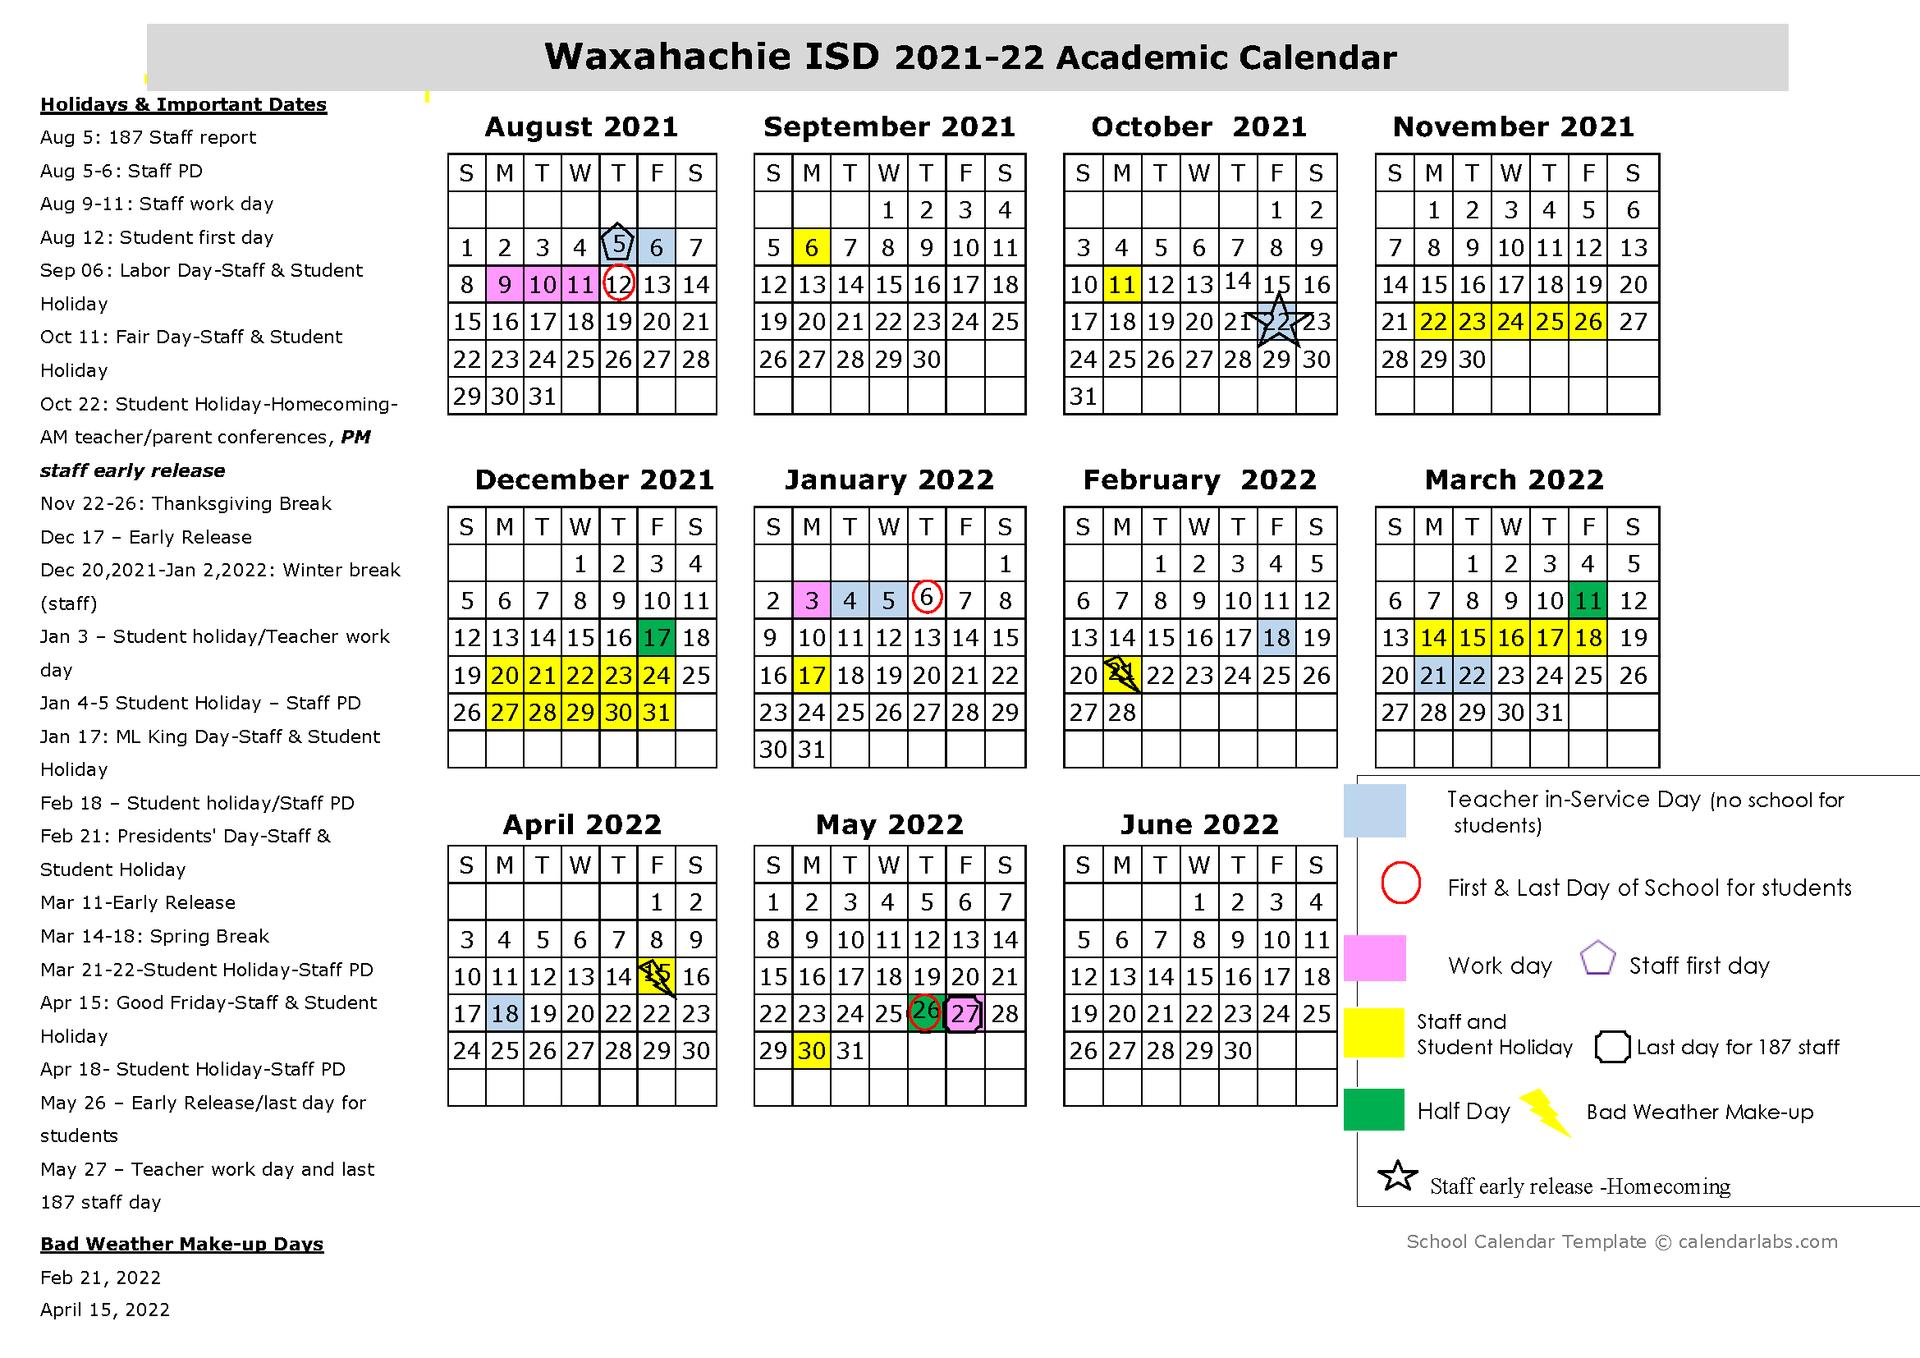 WISD school calendar for 2021-22